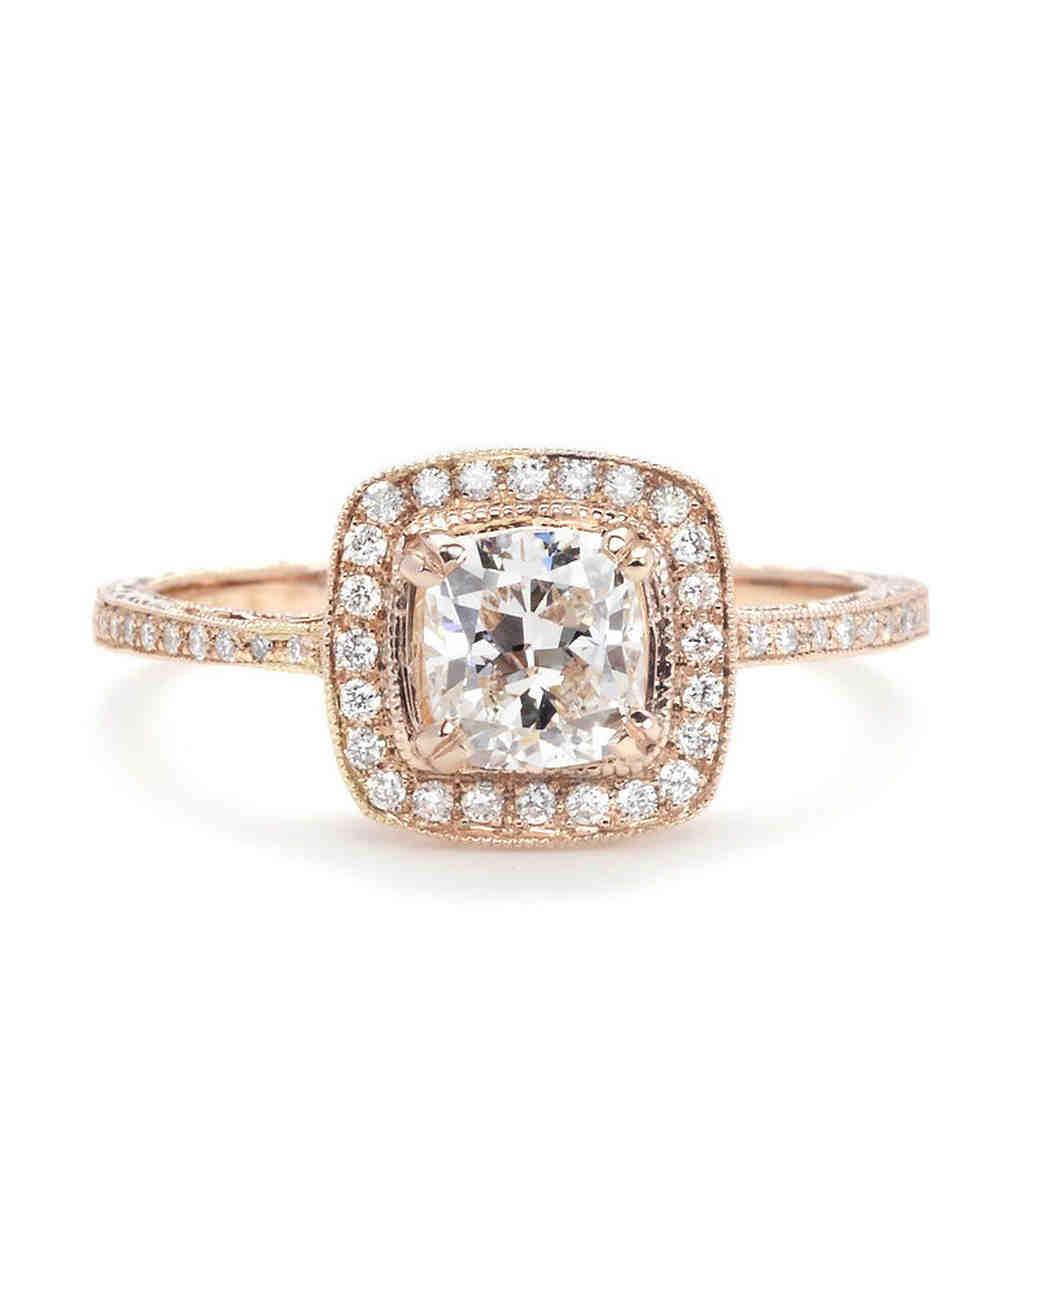 Beverly K Rose Gold Cushion-Cut Diamond Engagement Ring